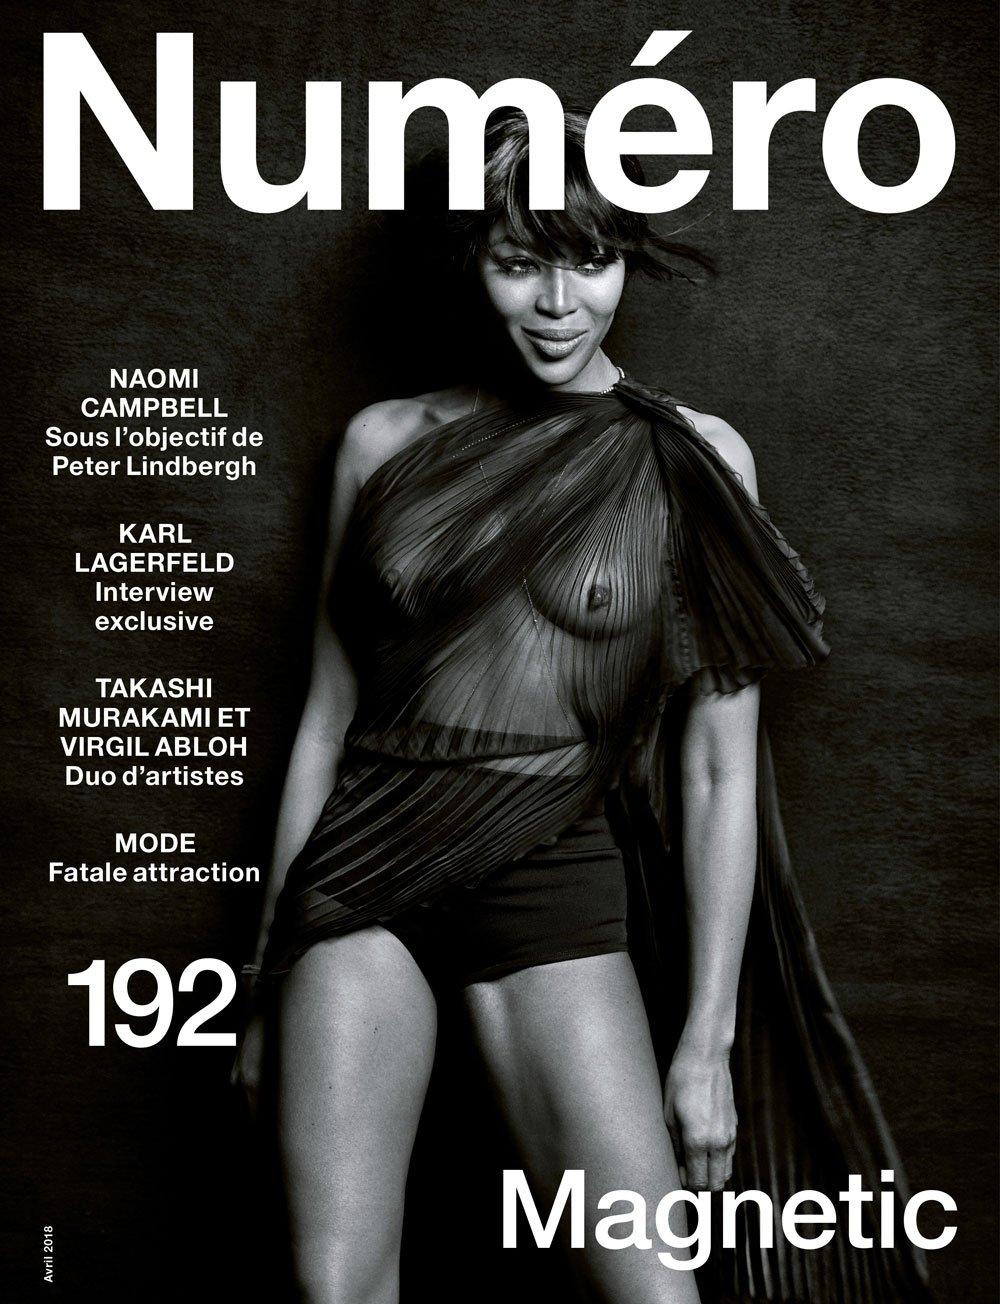 numero-magazine-naomicampbell-peter-lindbergh-babeth-djian-avril2018